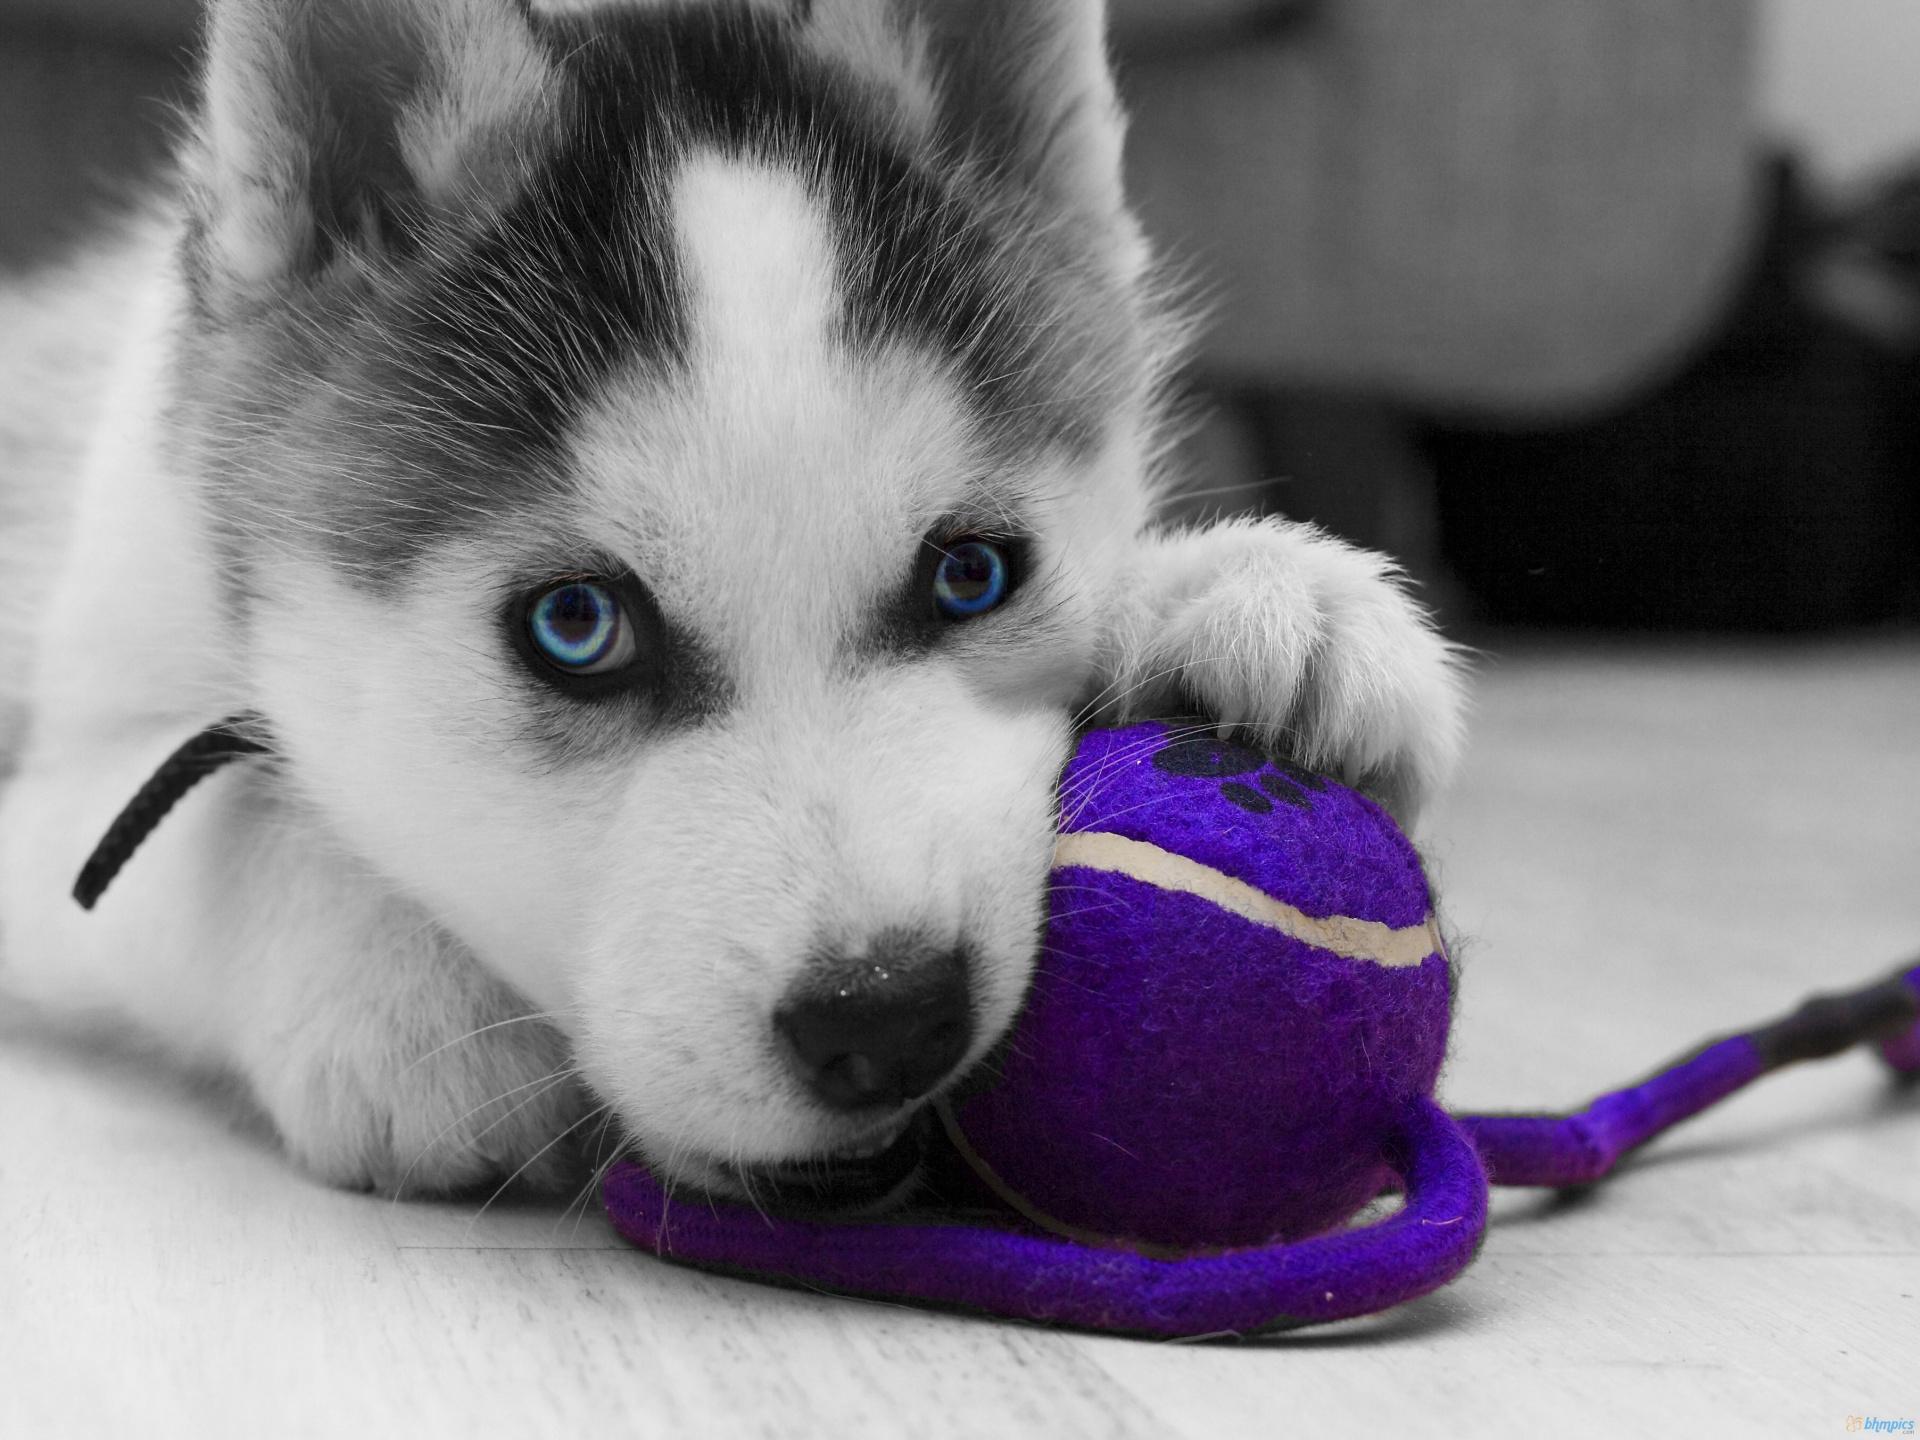 Husky Puppies At Play